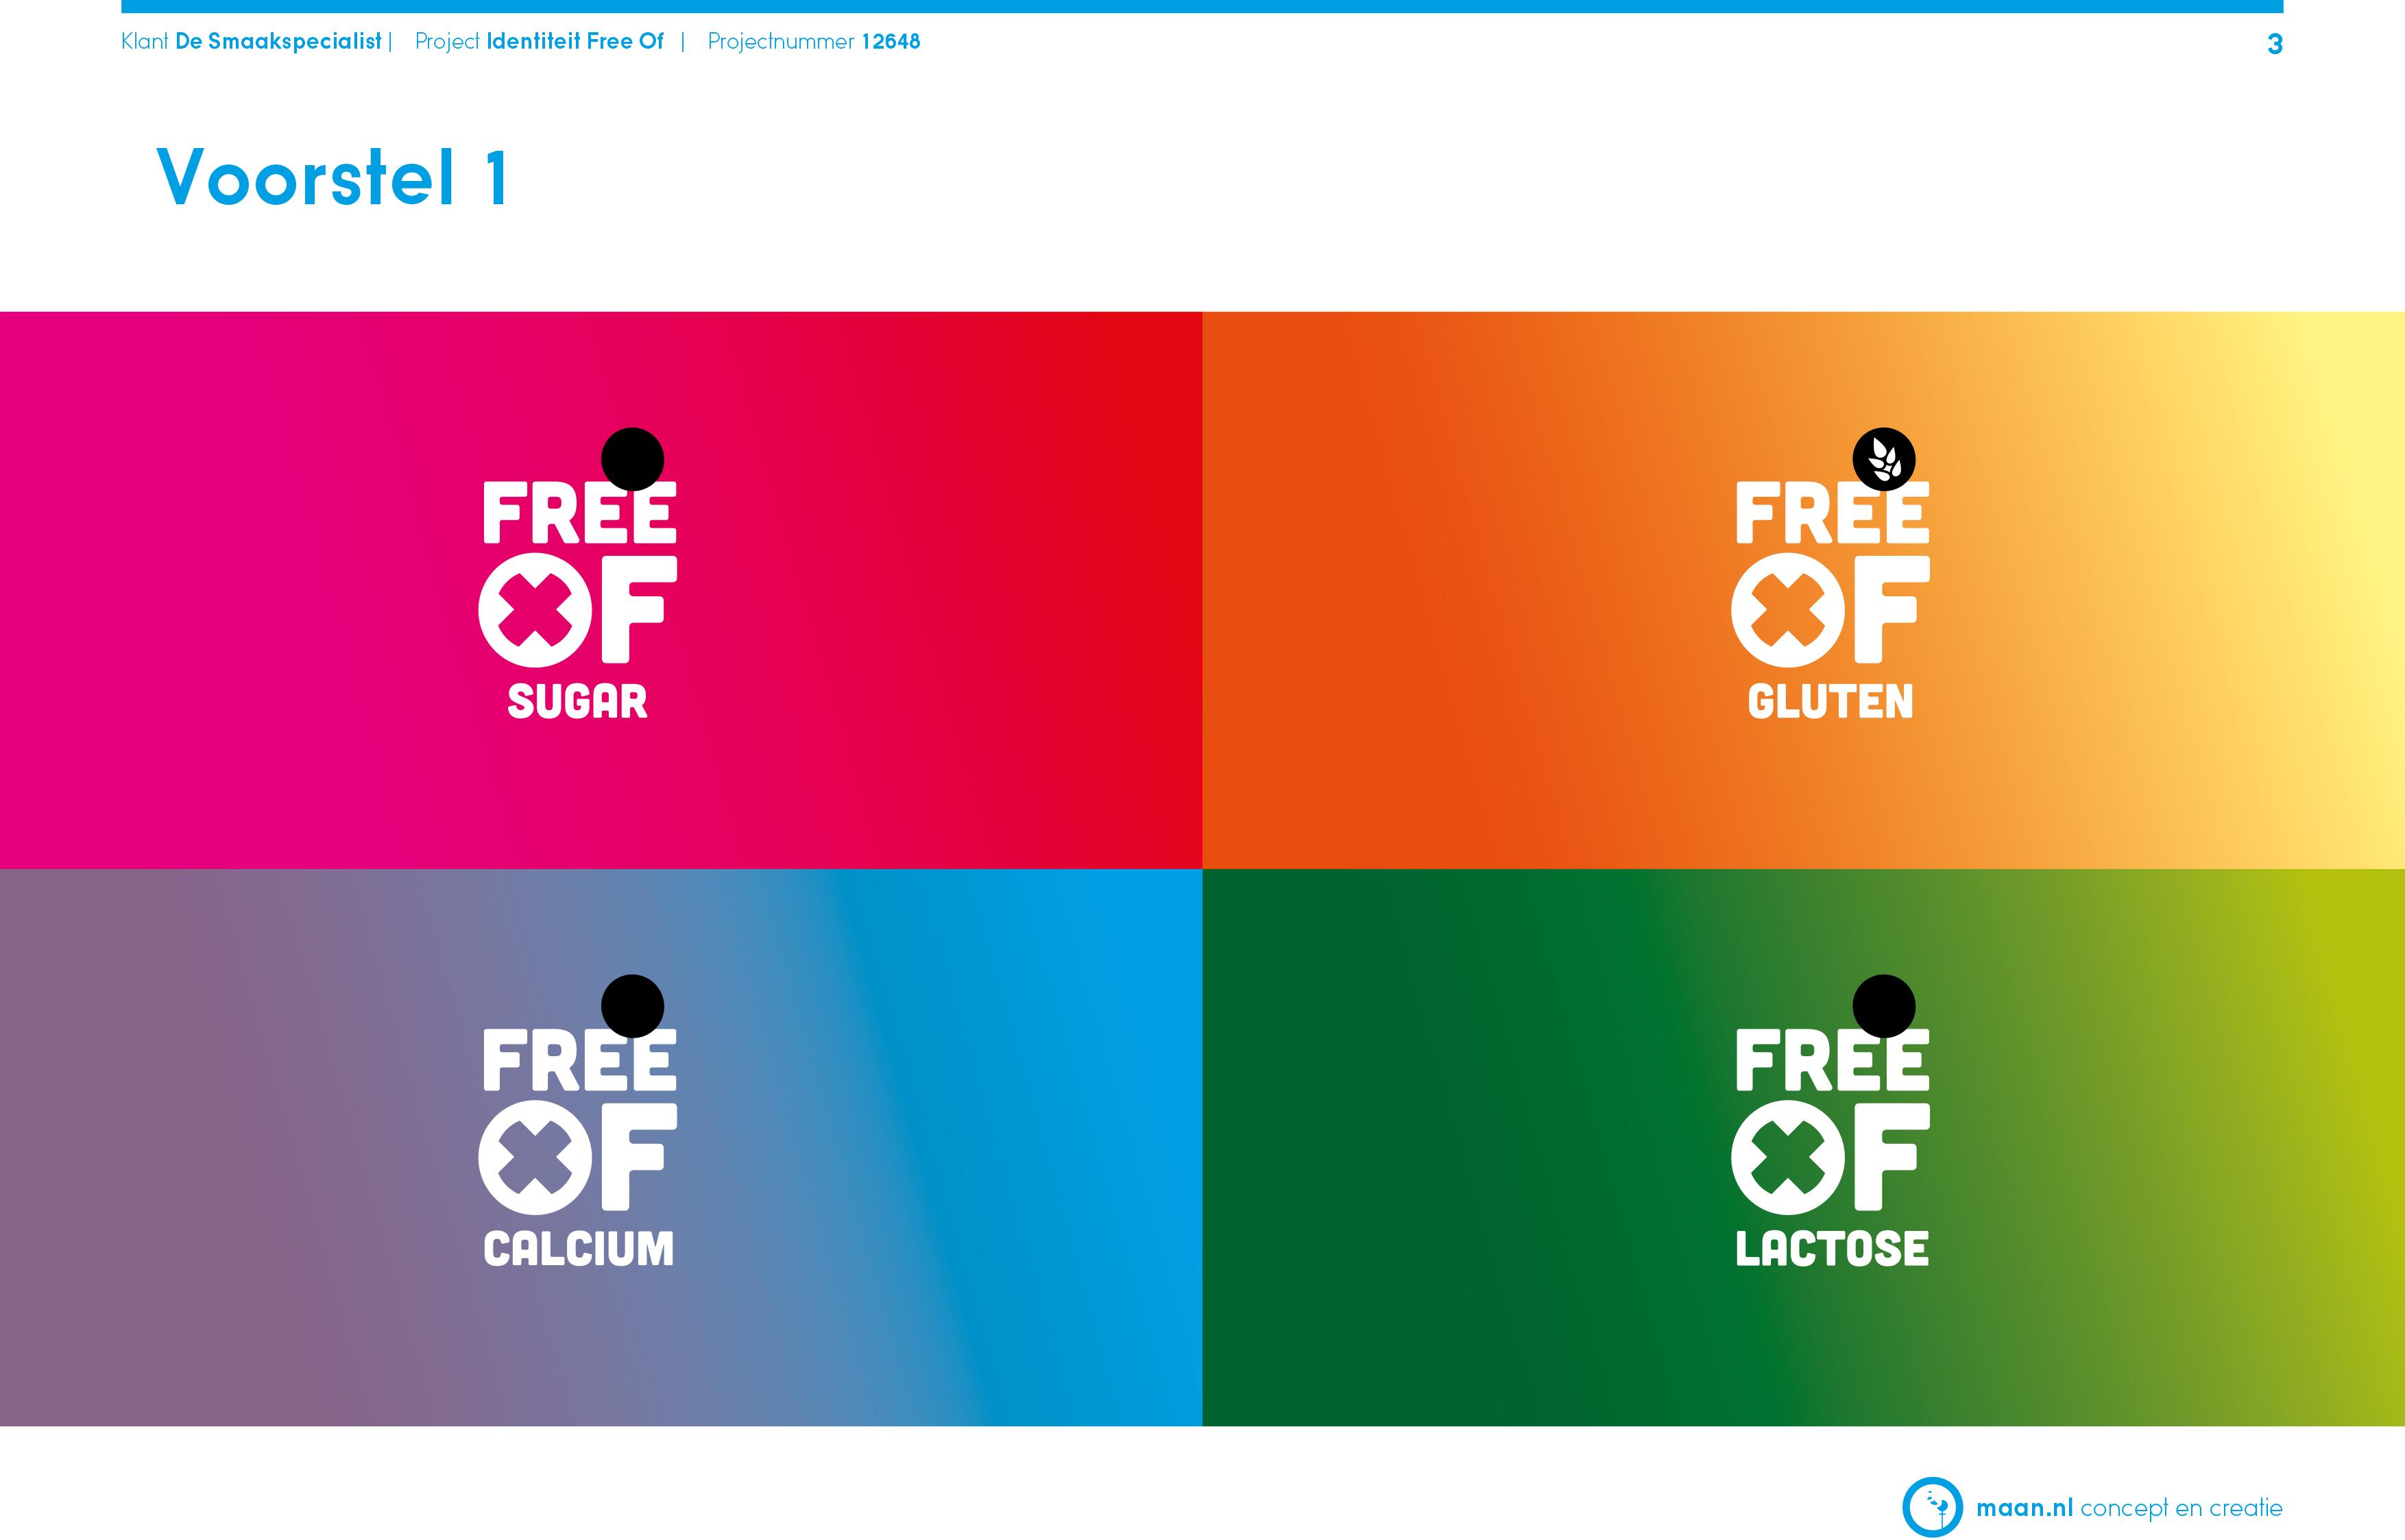 09-03-16-presentatie-concept-freeof-3